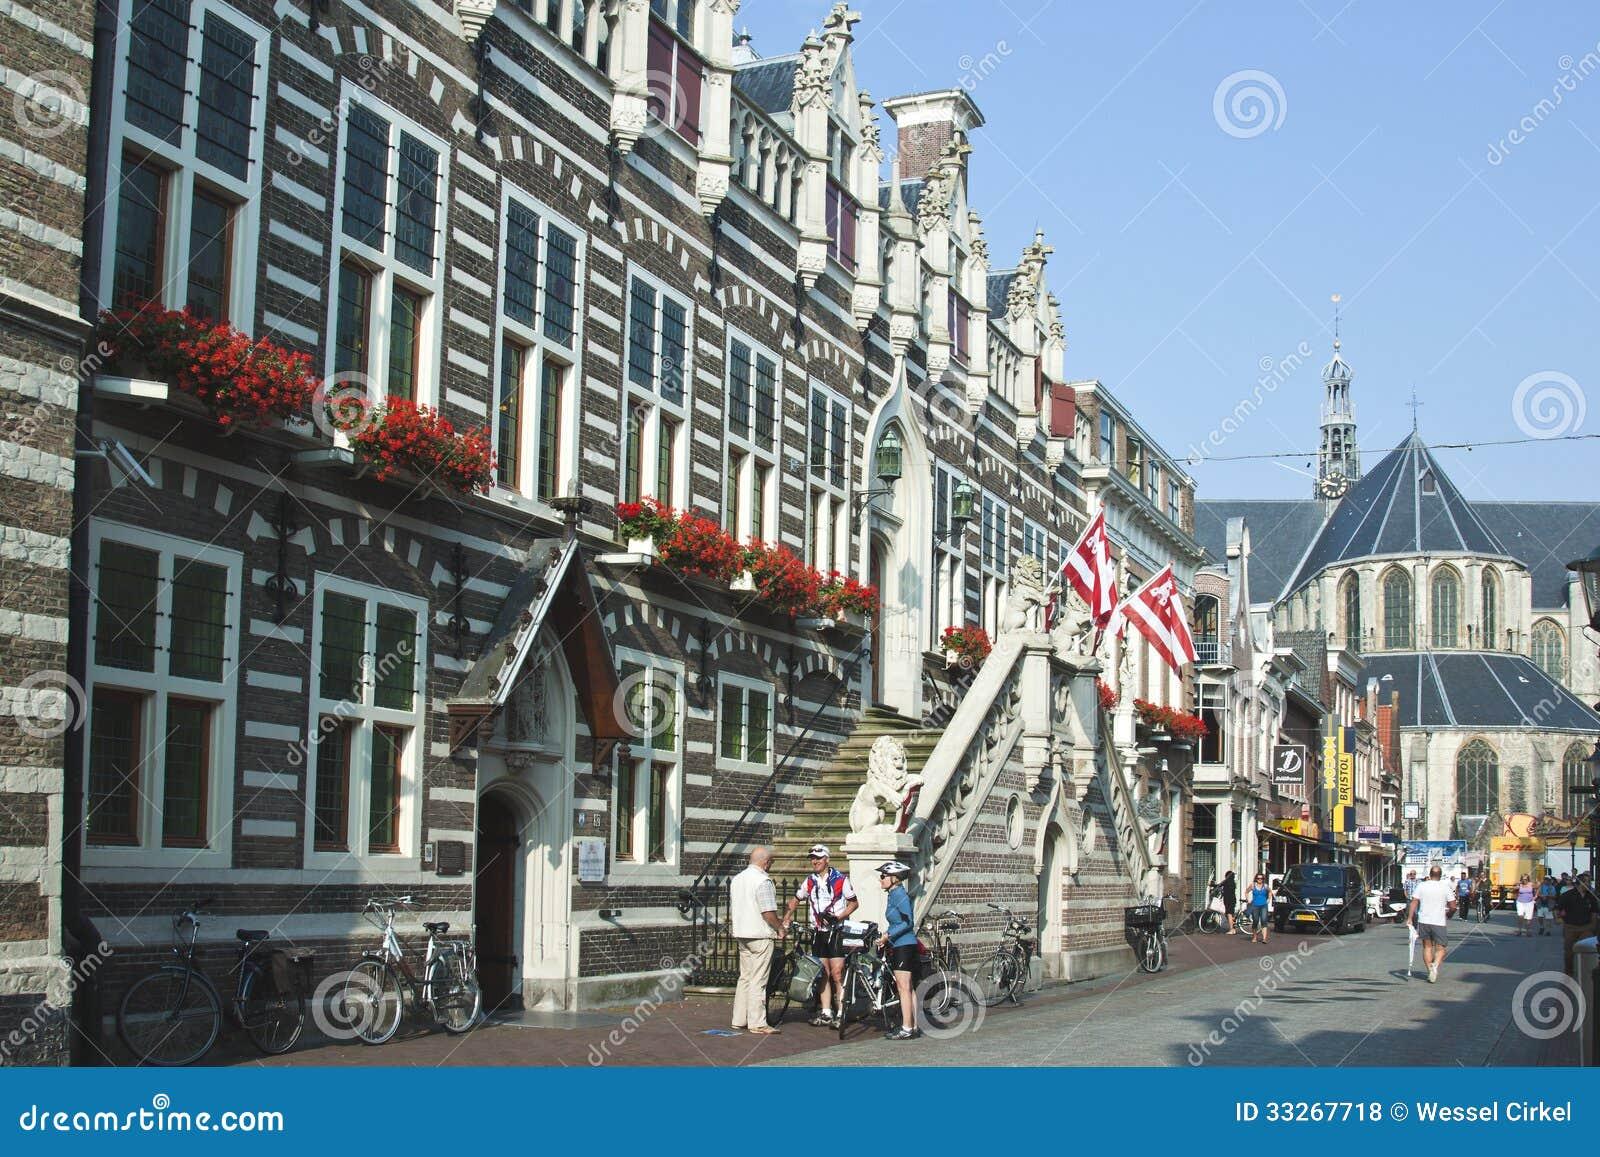 Old City Hall of Alkmaar in the Netherlands